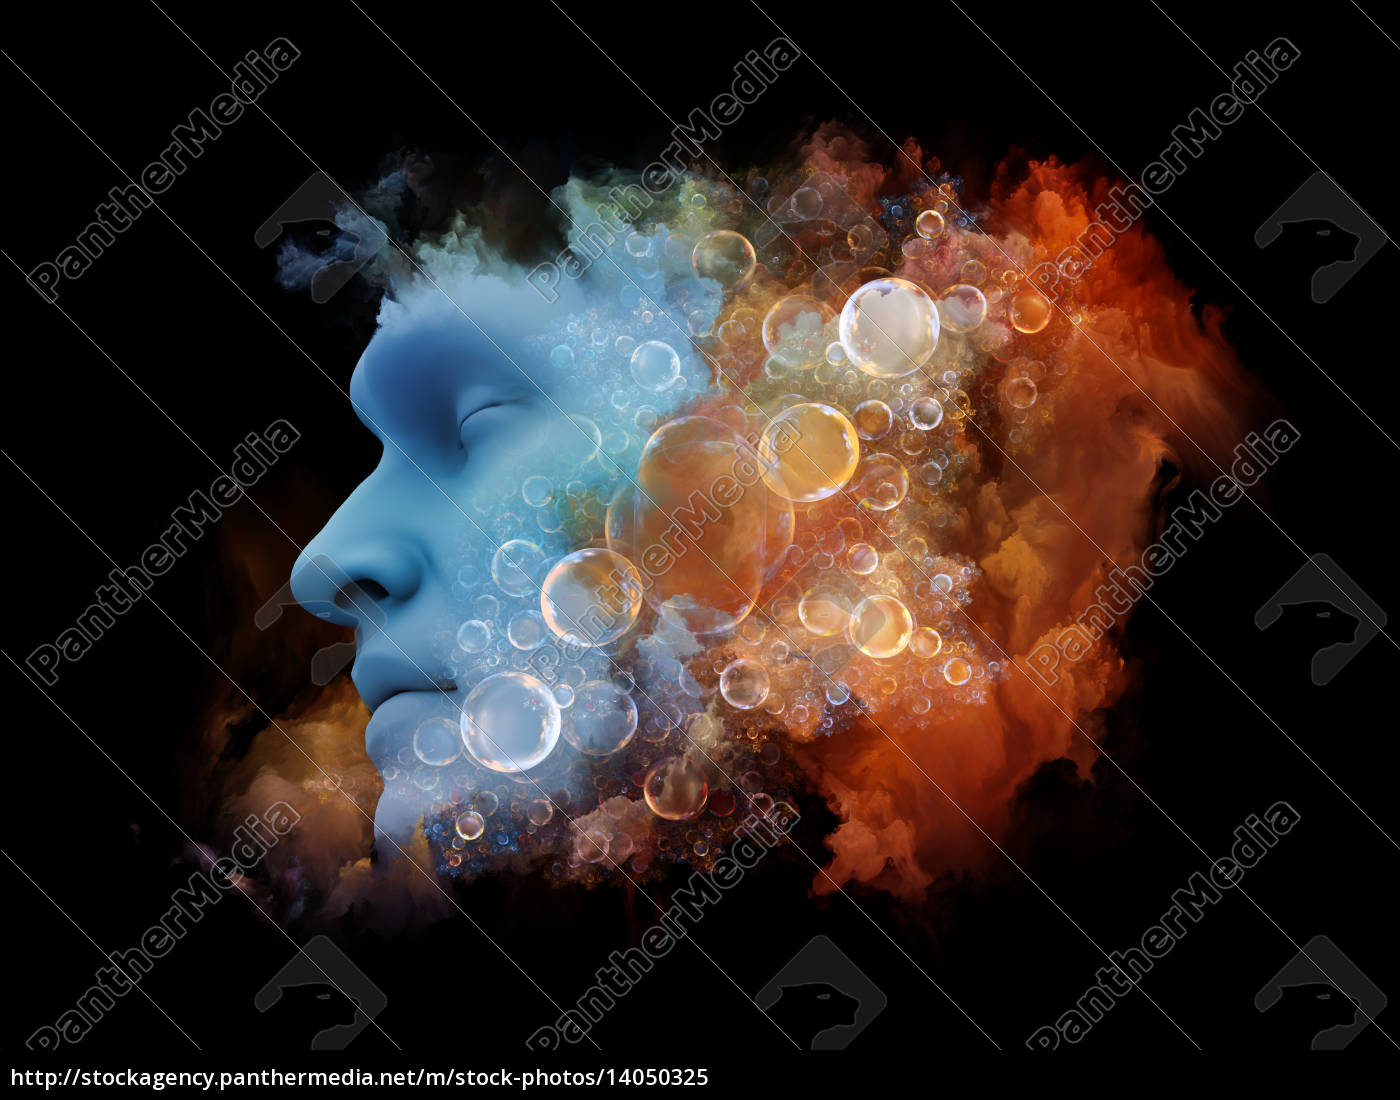 metaphorical, dream - 14050325